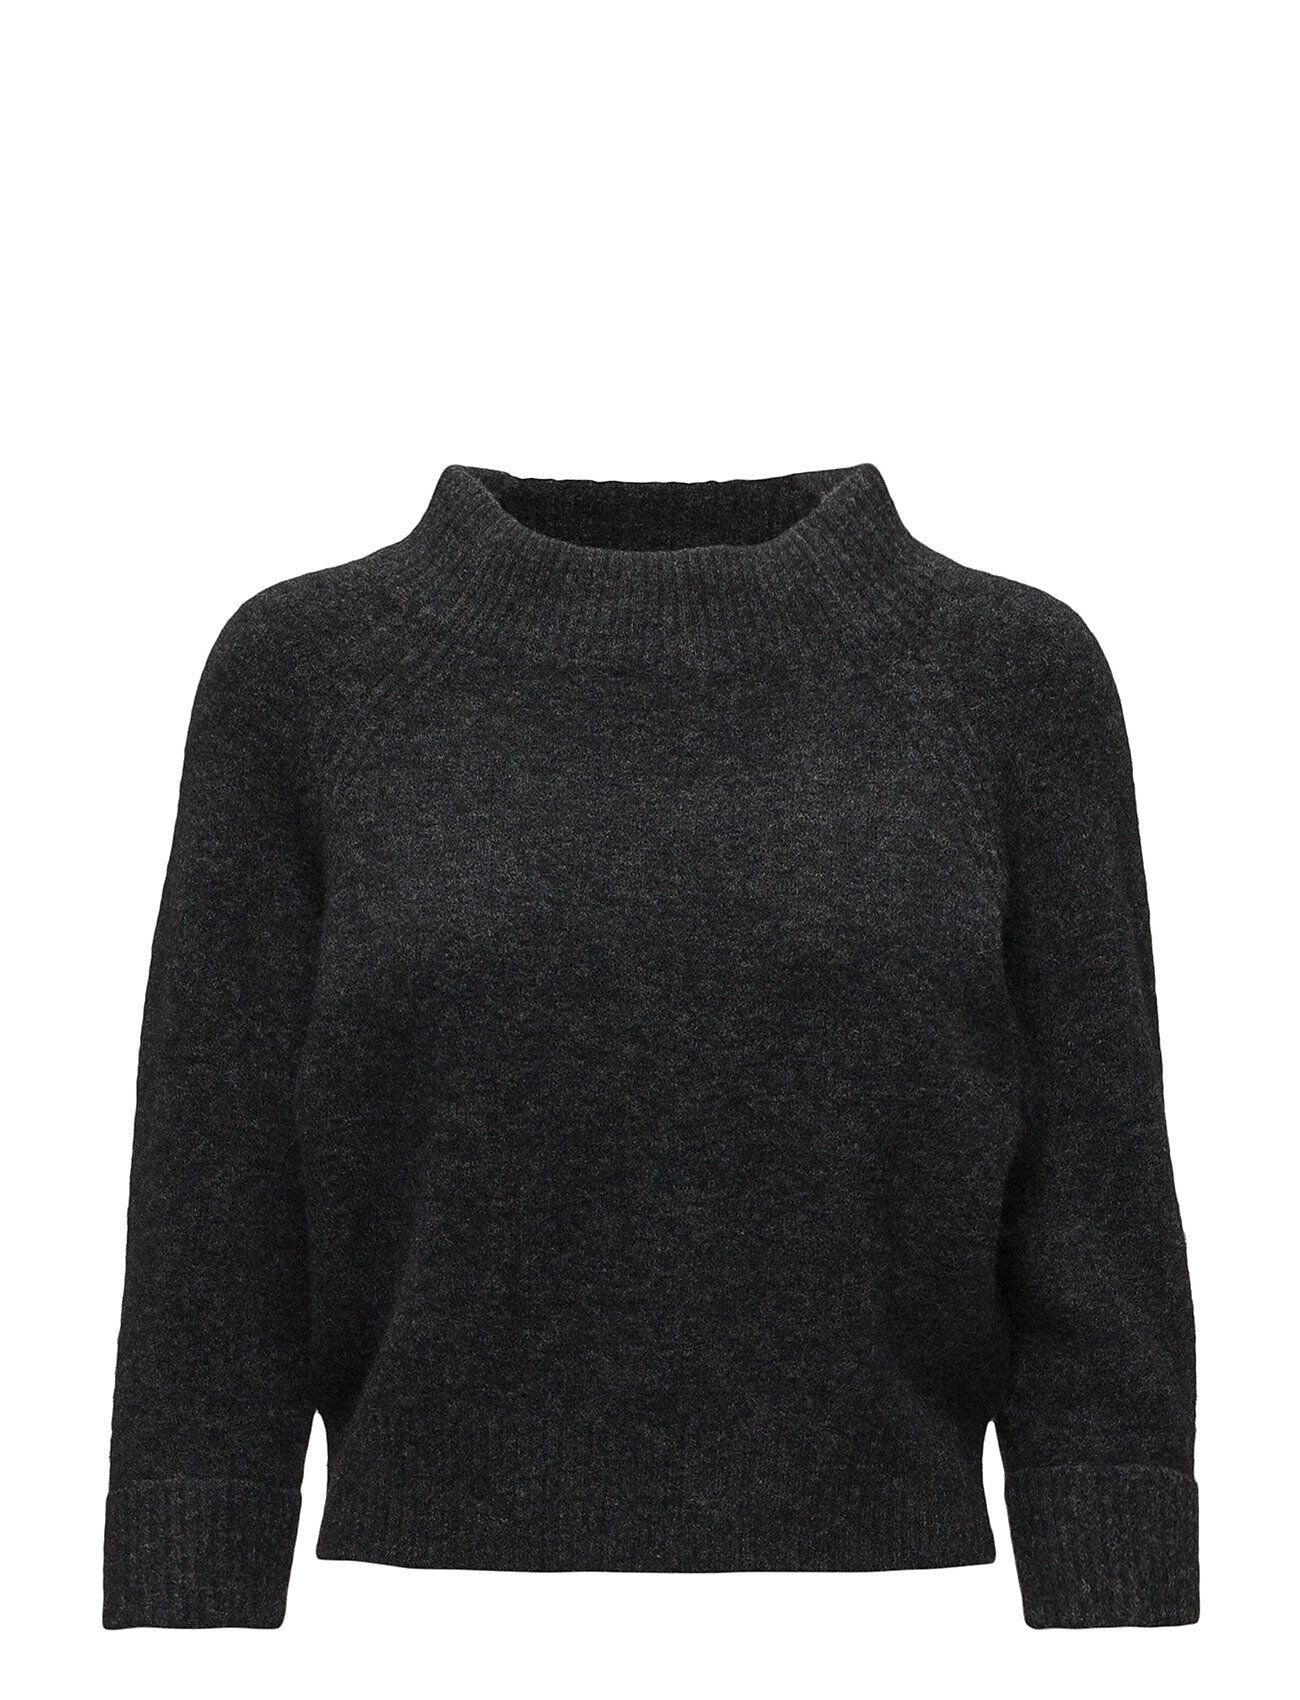 3.1 Phillip Lim Lofty 3/4 Slv Mock Neck Sweater